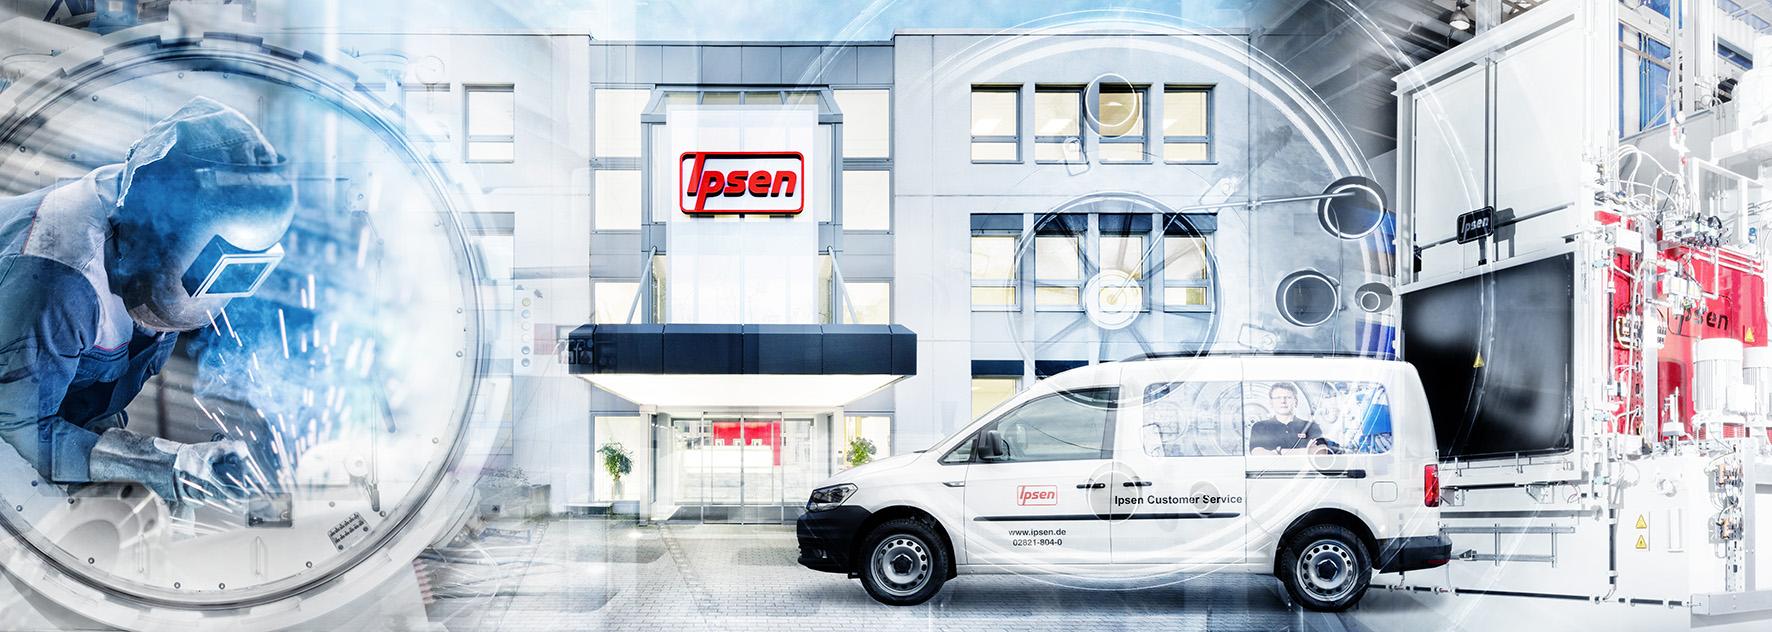 Ipsen International GmbH